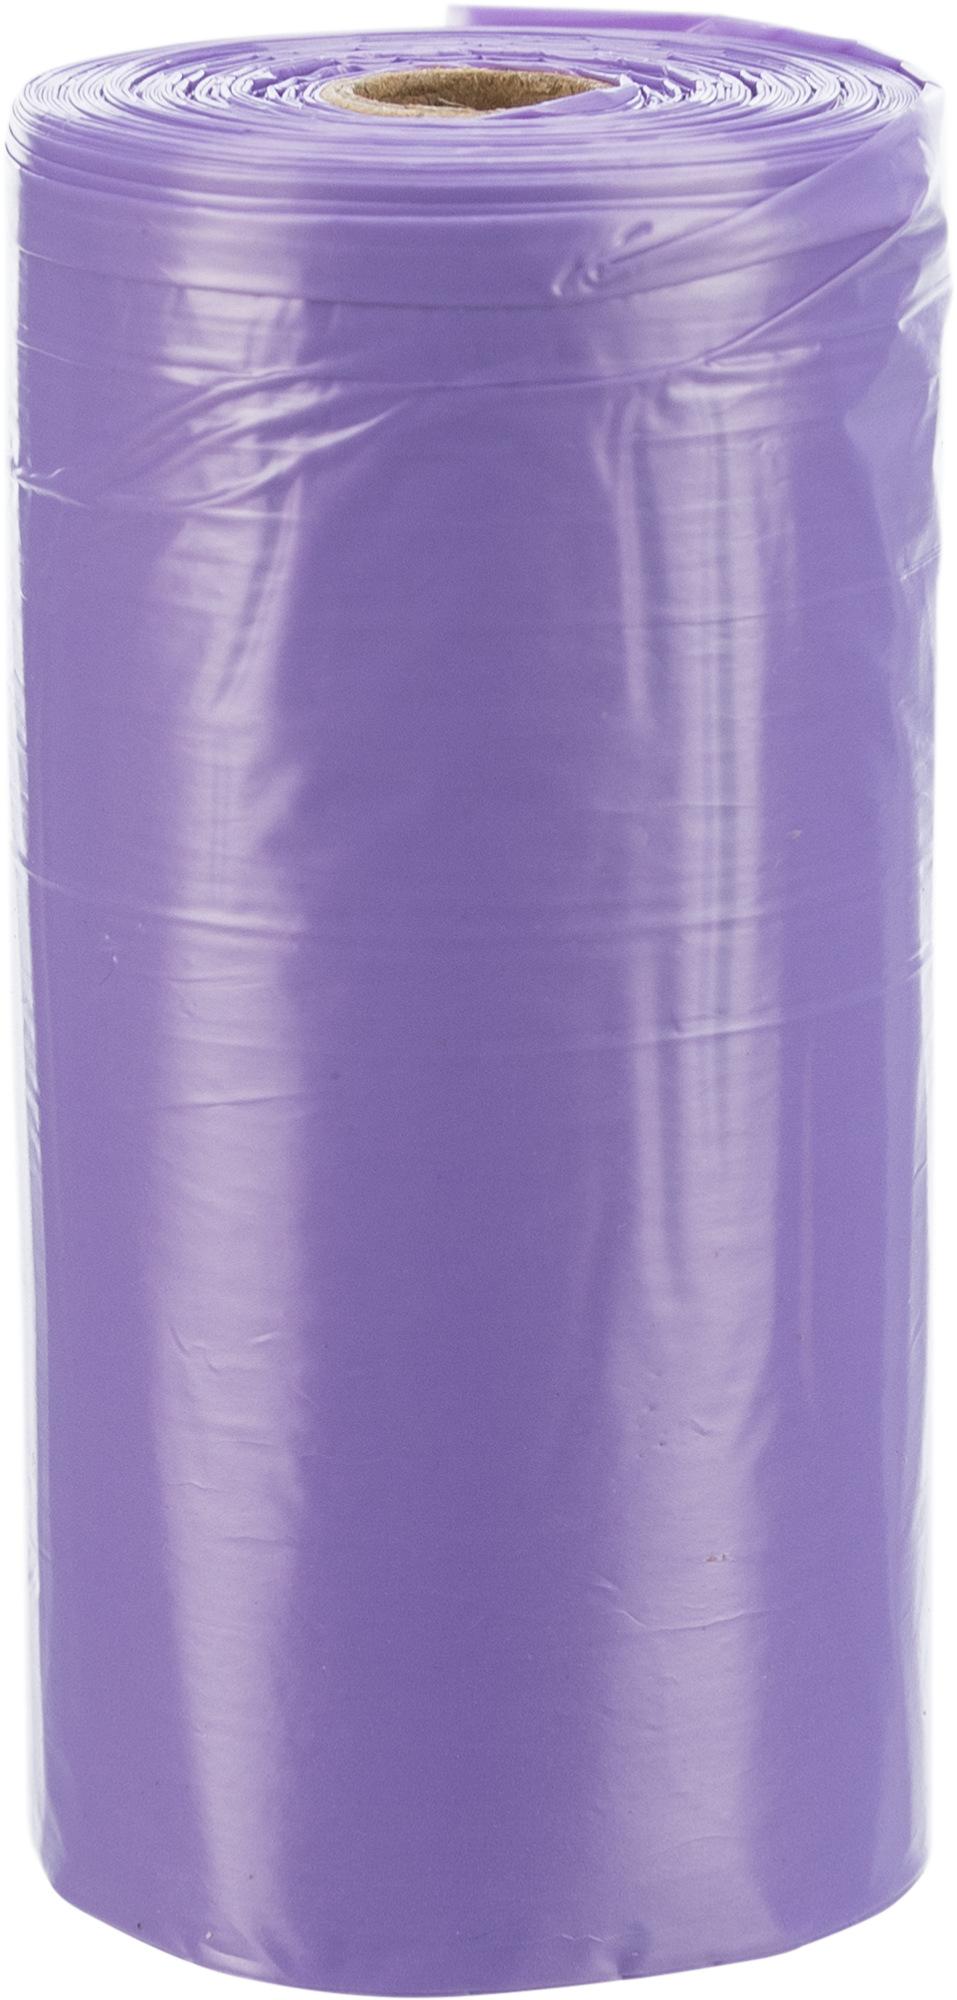 Trixie Dog Pick Up Hundekotbeutel mit Lavendelduft M, 4 Rollen à 20 St., lila